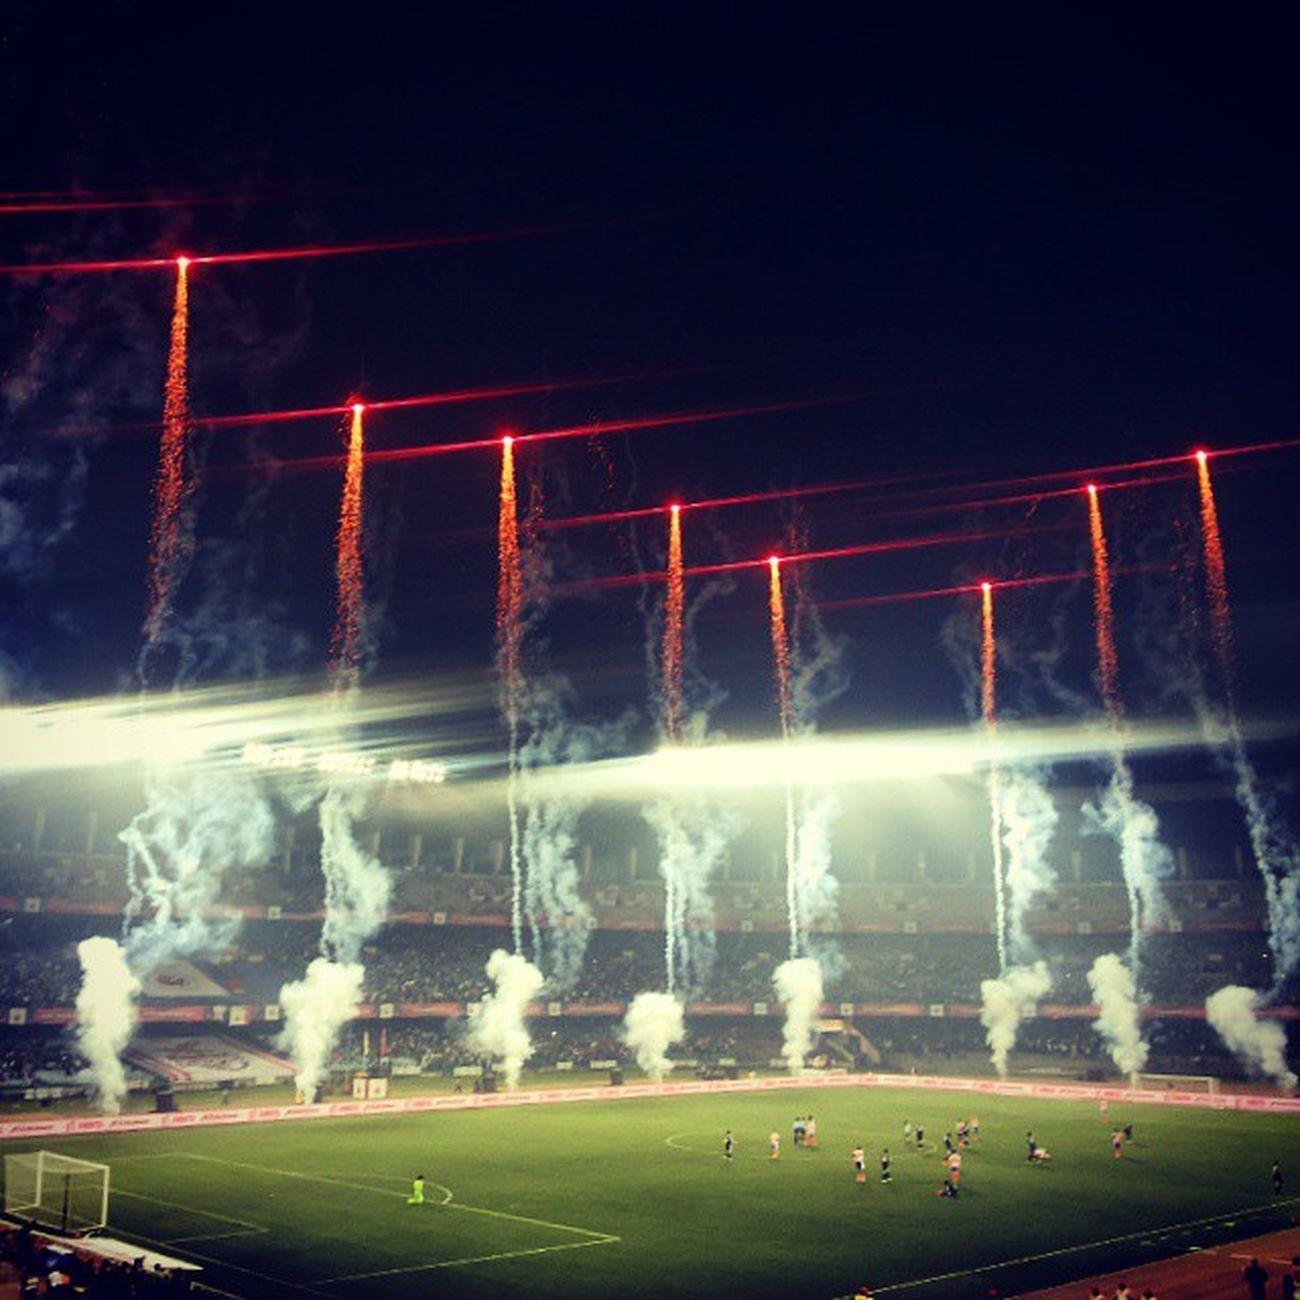 Fatafati Football ! Another Victory for Atletico de Kolkata . Live from Salt Lake Stadium. Amazing Evening . :) ADK Isl Fireworks Beautiful